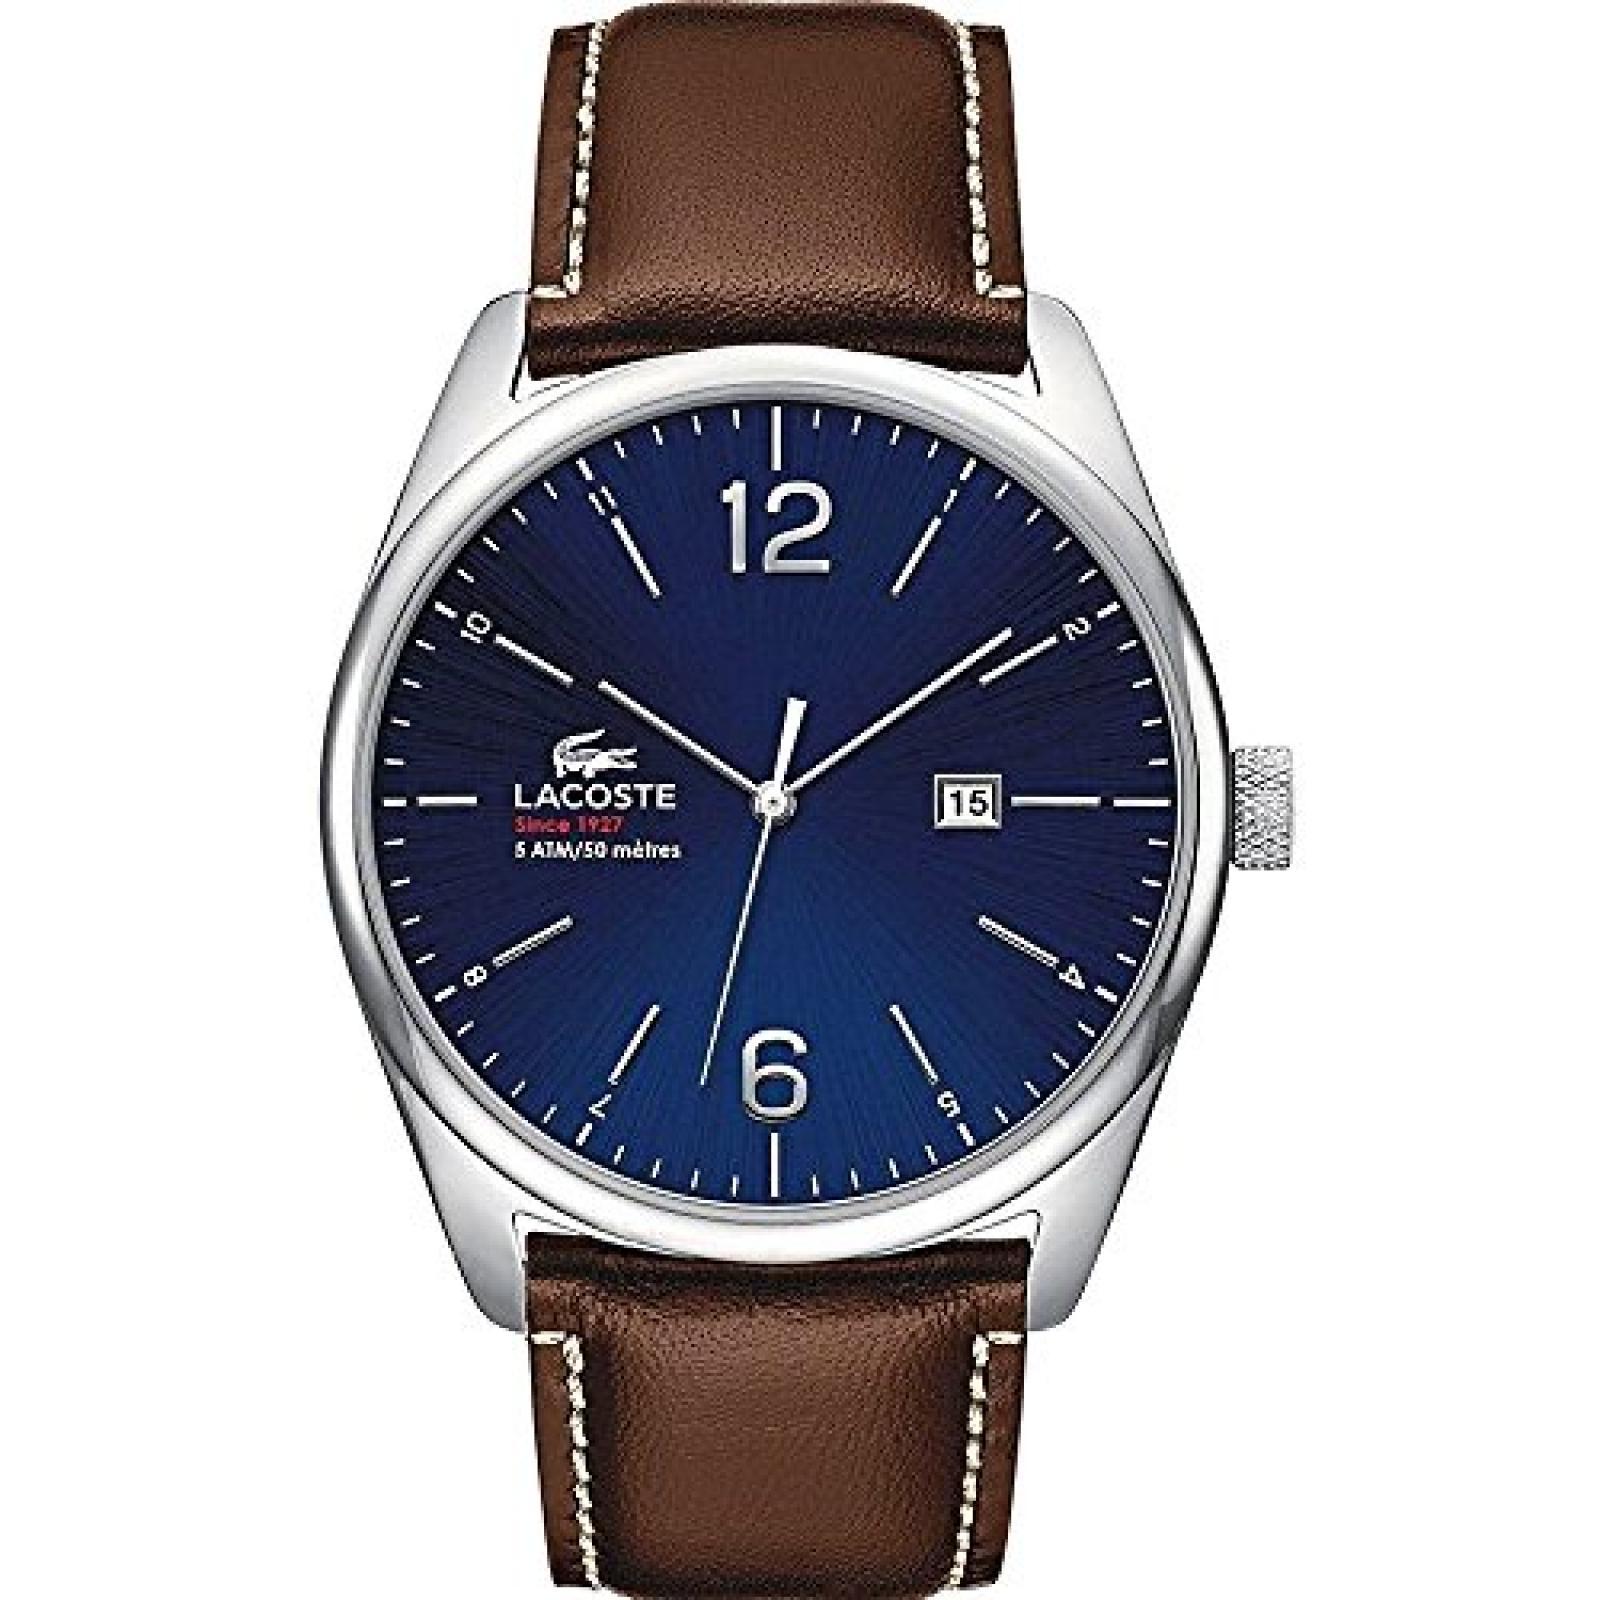 Lacoste Herren-Armbanduhr XL AUSTIN Analog Quarz Leder 2010749